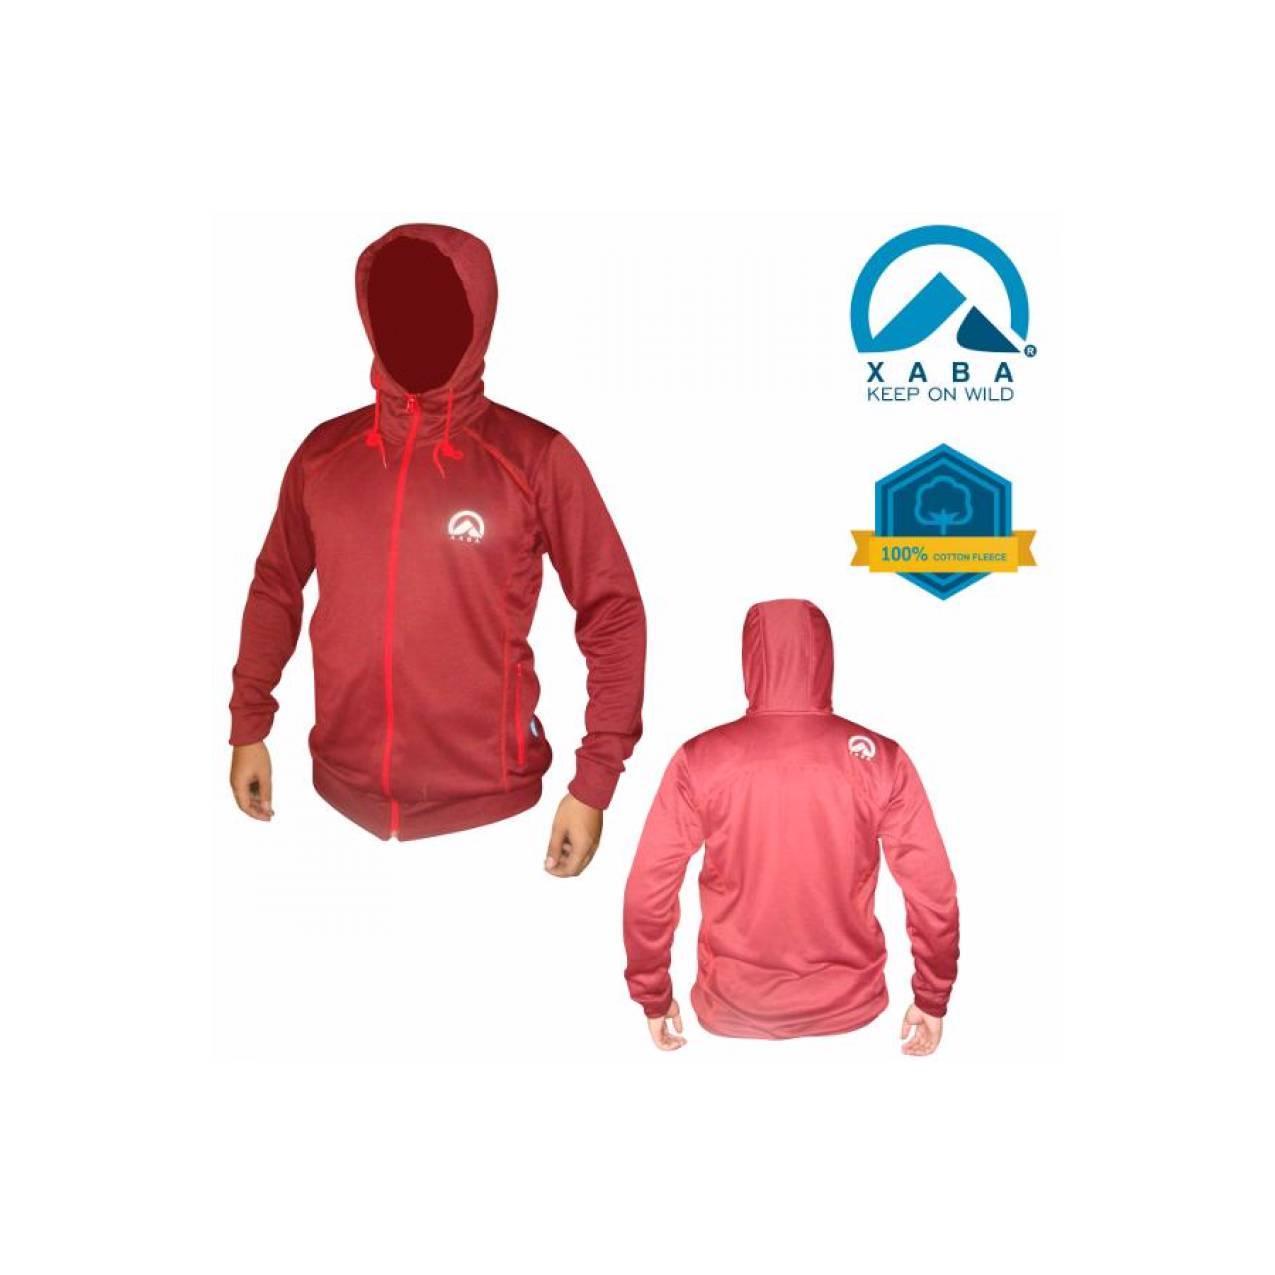 Xaba Gaiter Gaither Pelindung Kaki For Hiking Black Red Outdoor Geiter Source Rp 316500